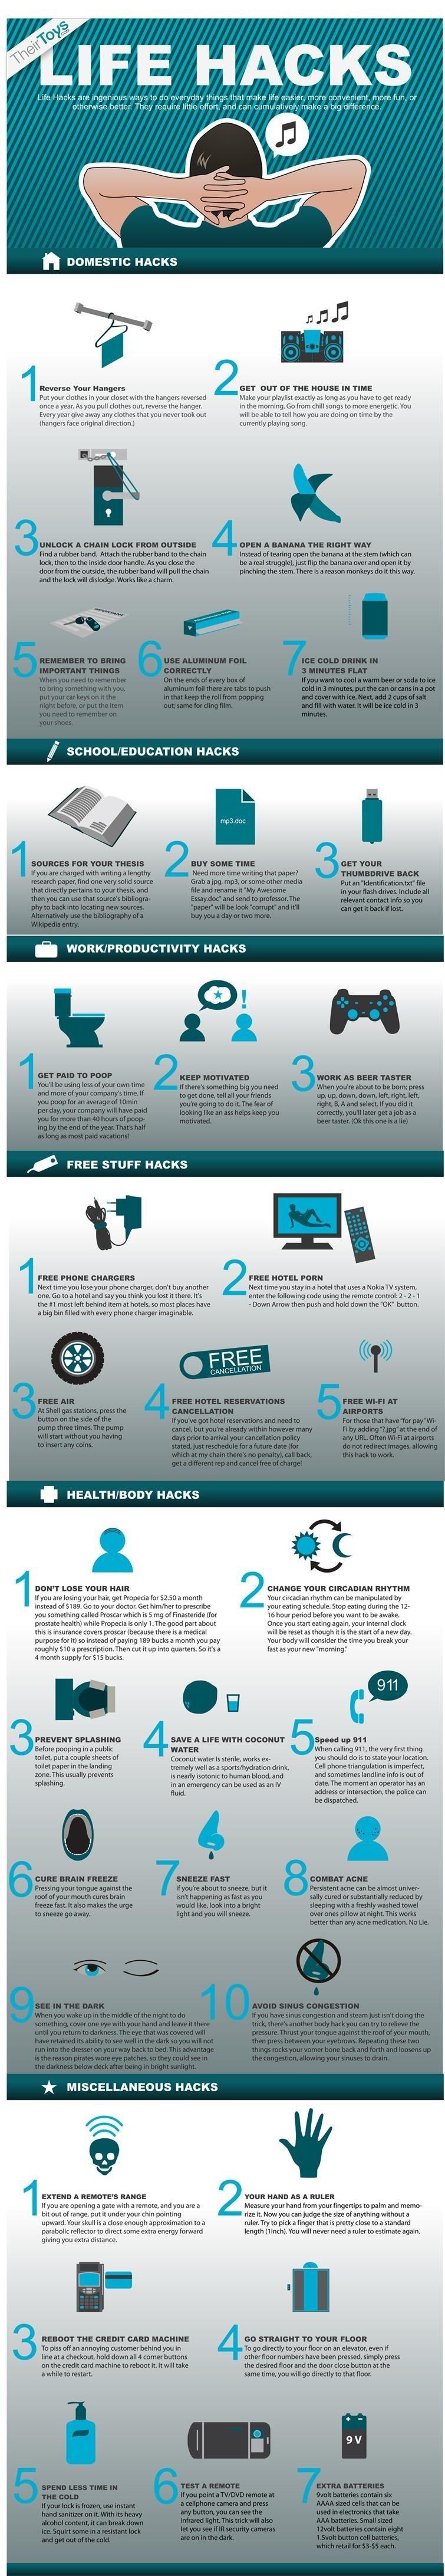 Life Hacks. Easy, yet simple. Not Oc.